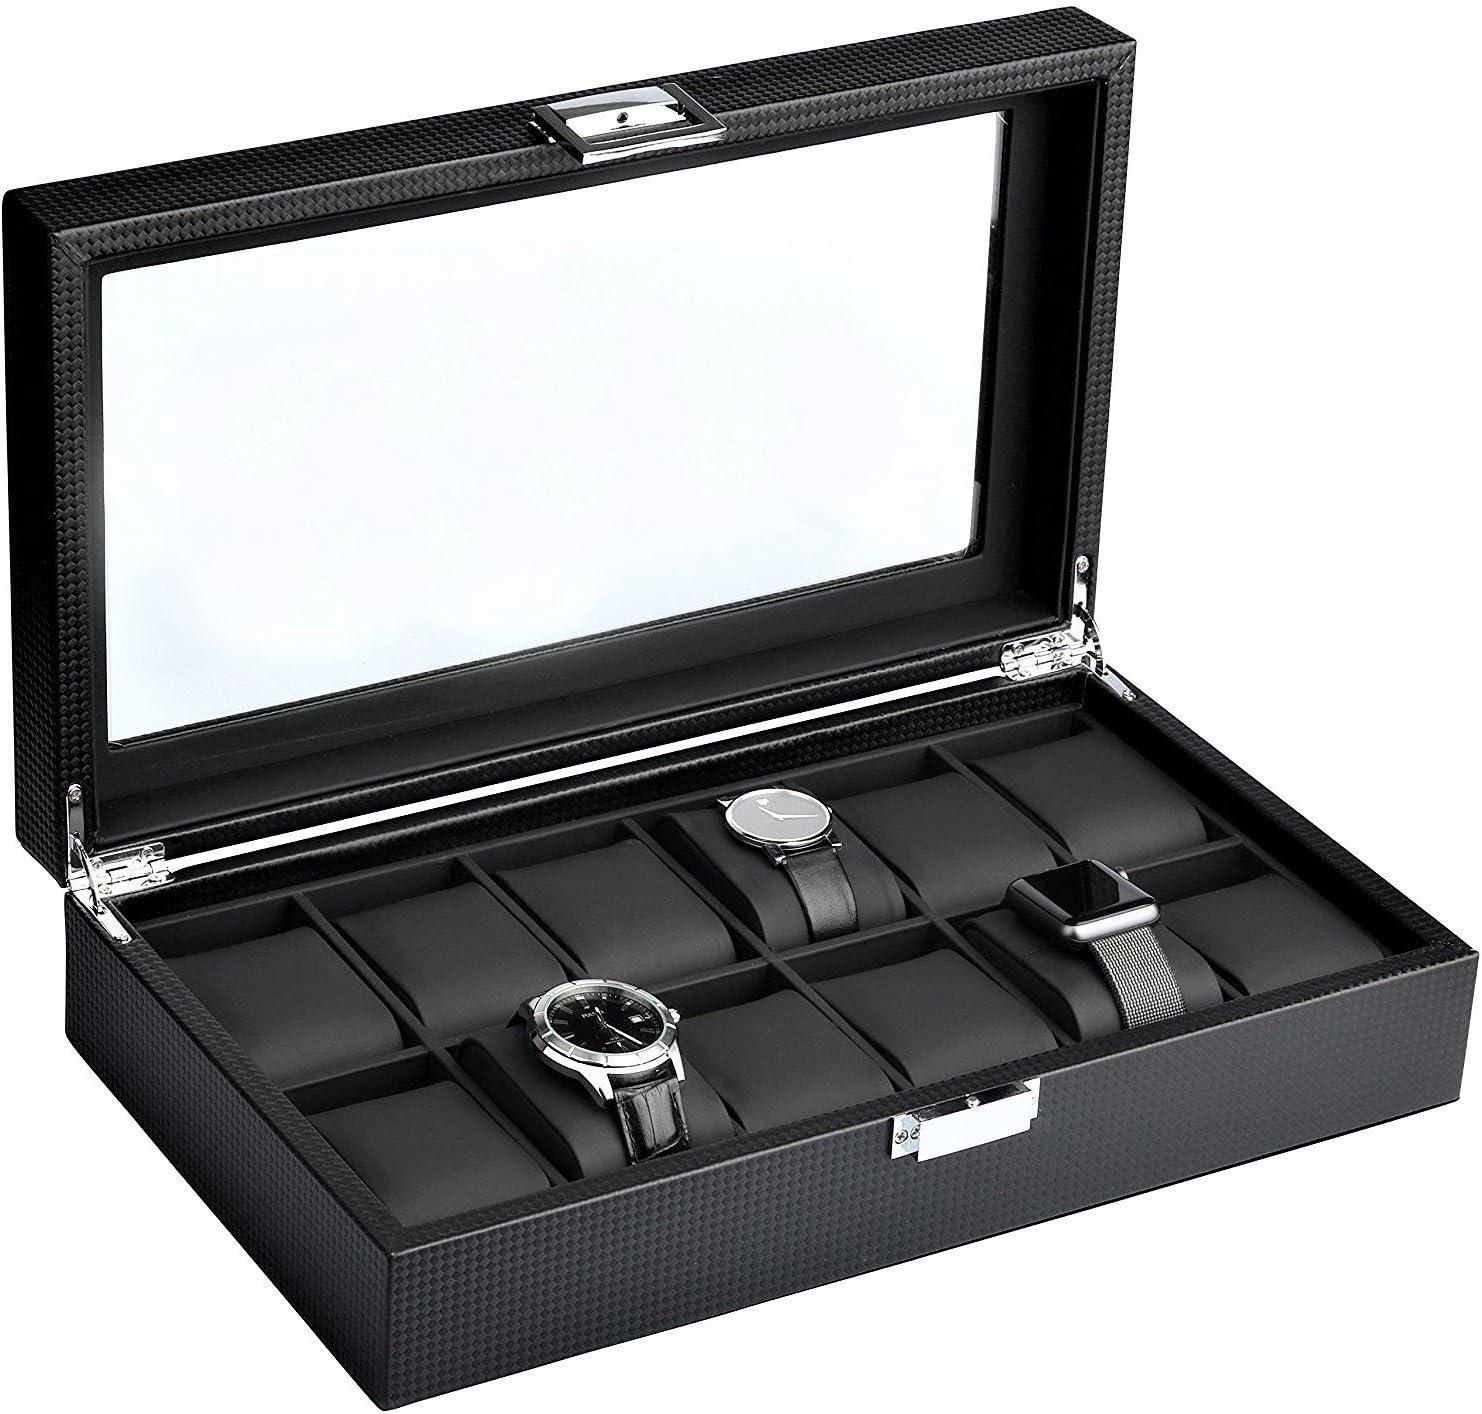 Luxury Black Carbon Fiber 12 Slot Watch//Jewelry Storage Display Case Boxes